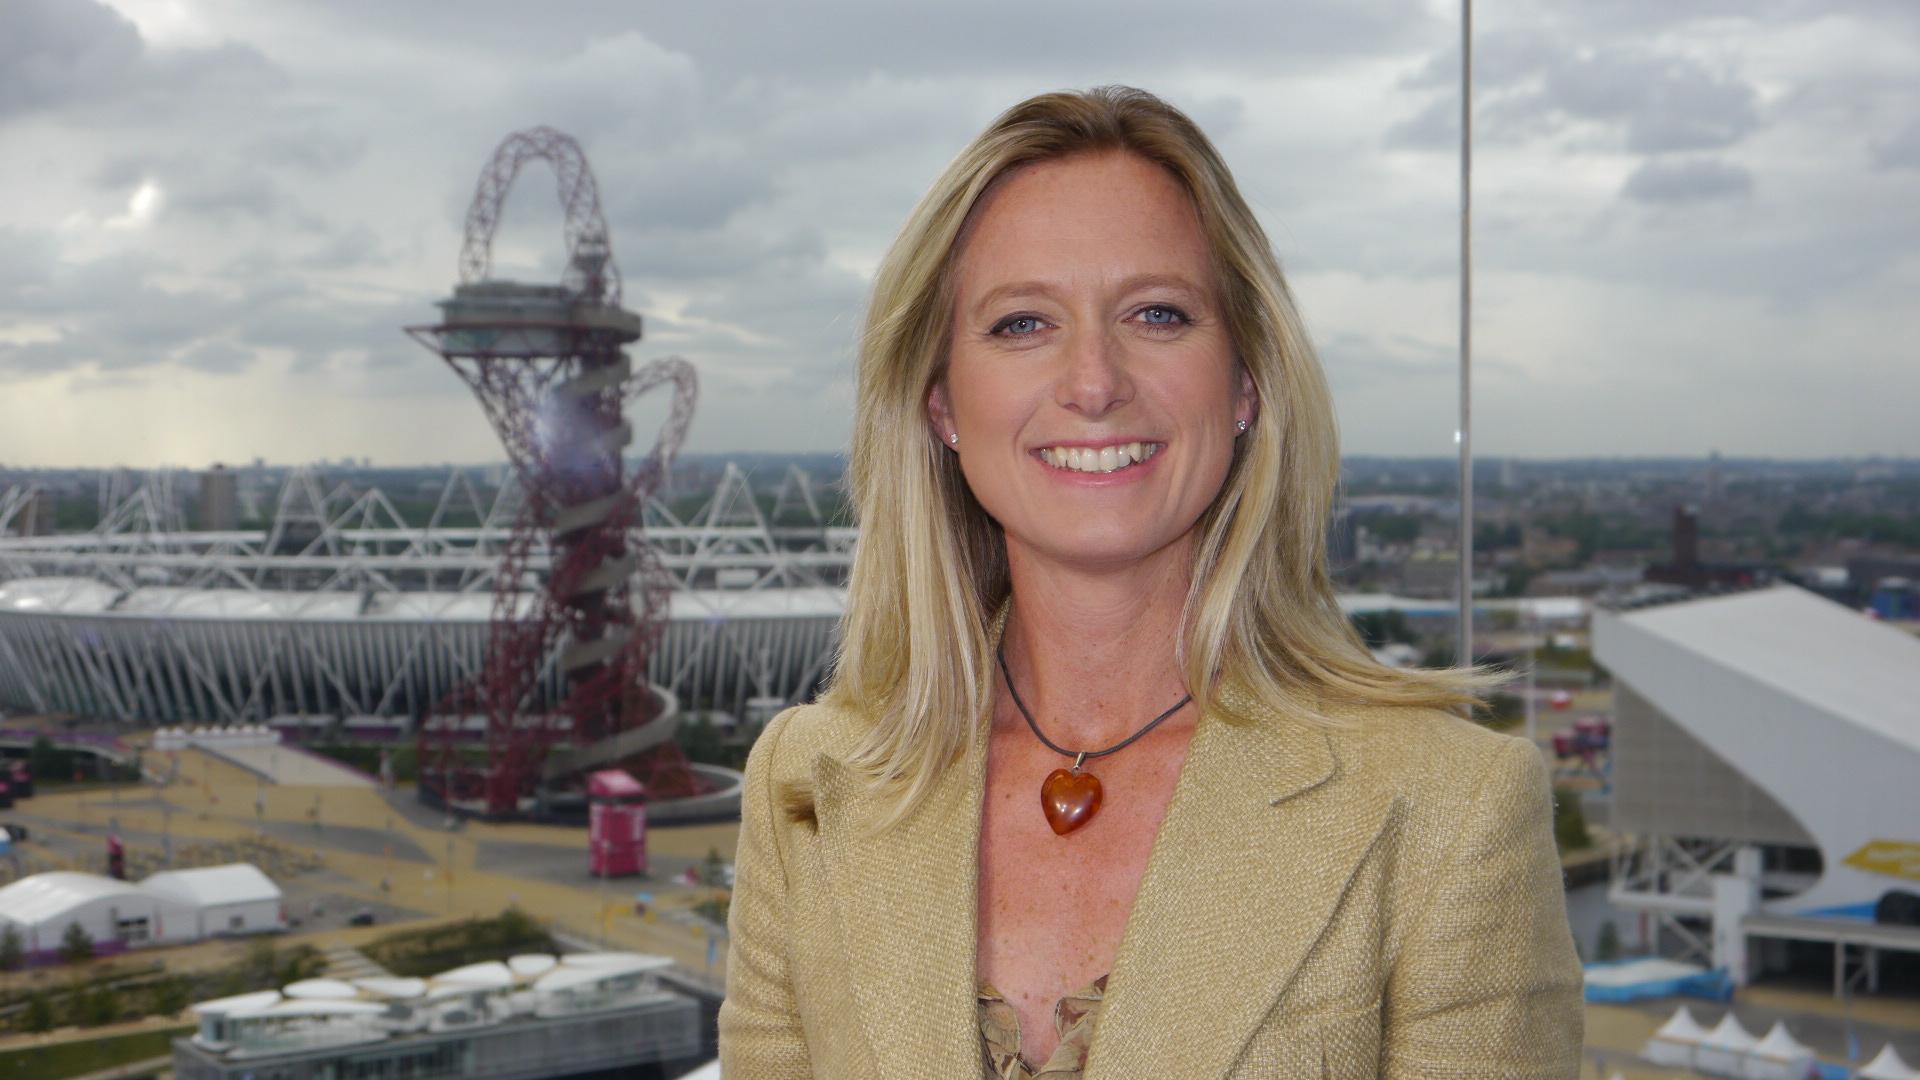 Caroline Rowland in front of Olympic Stadium